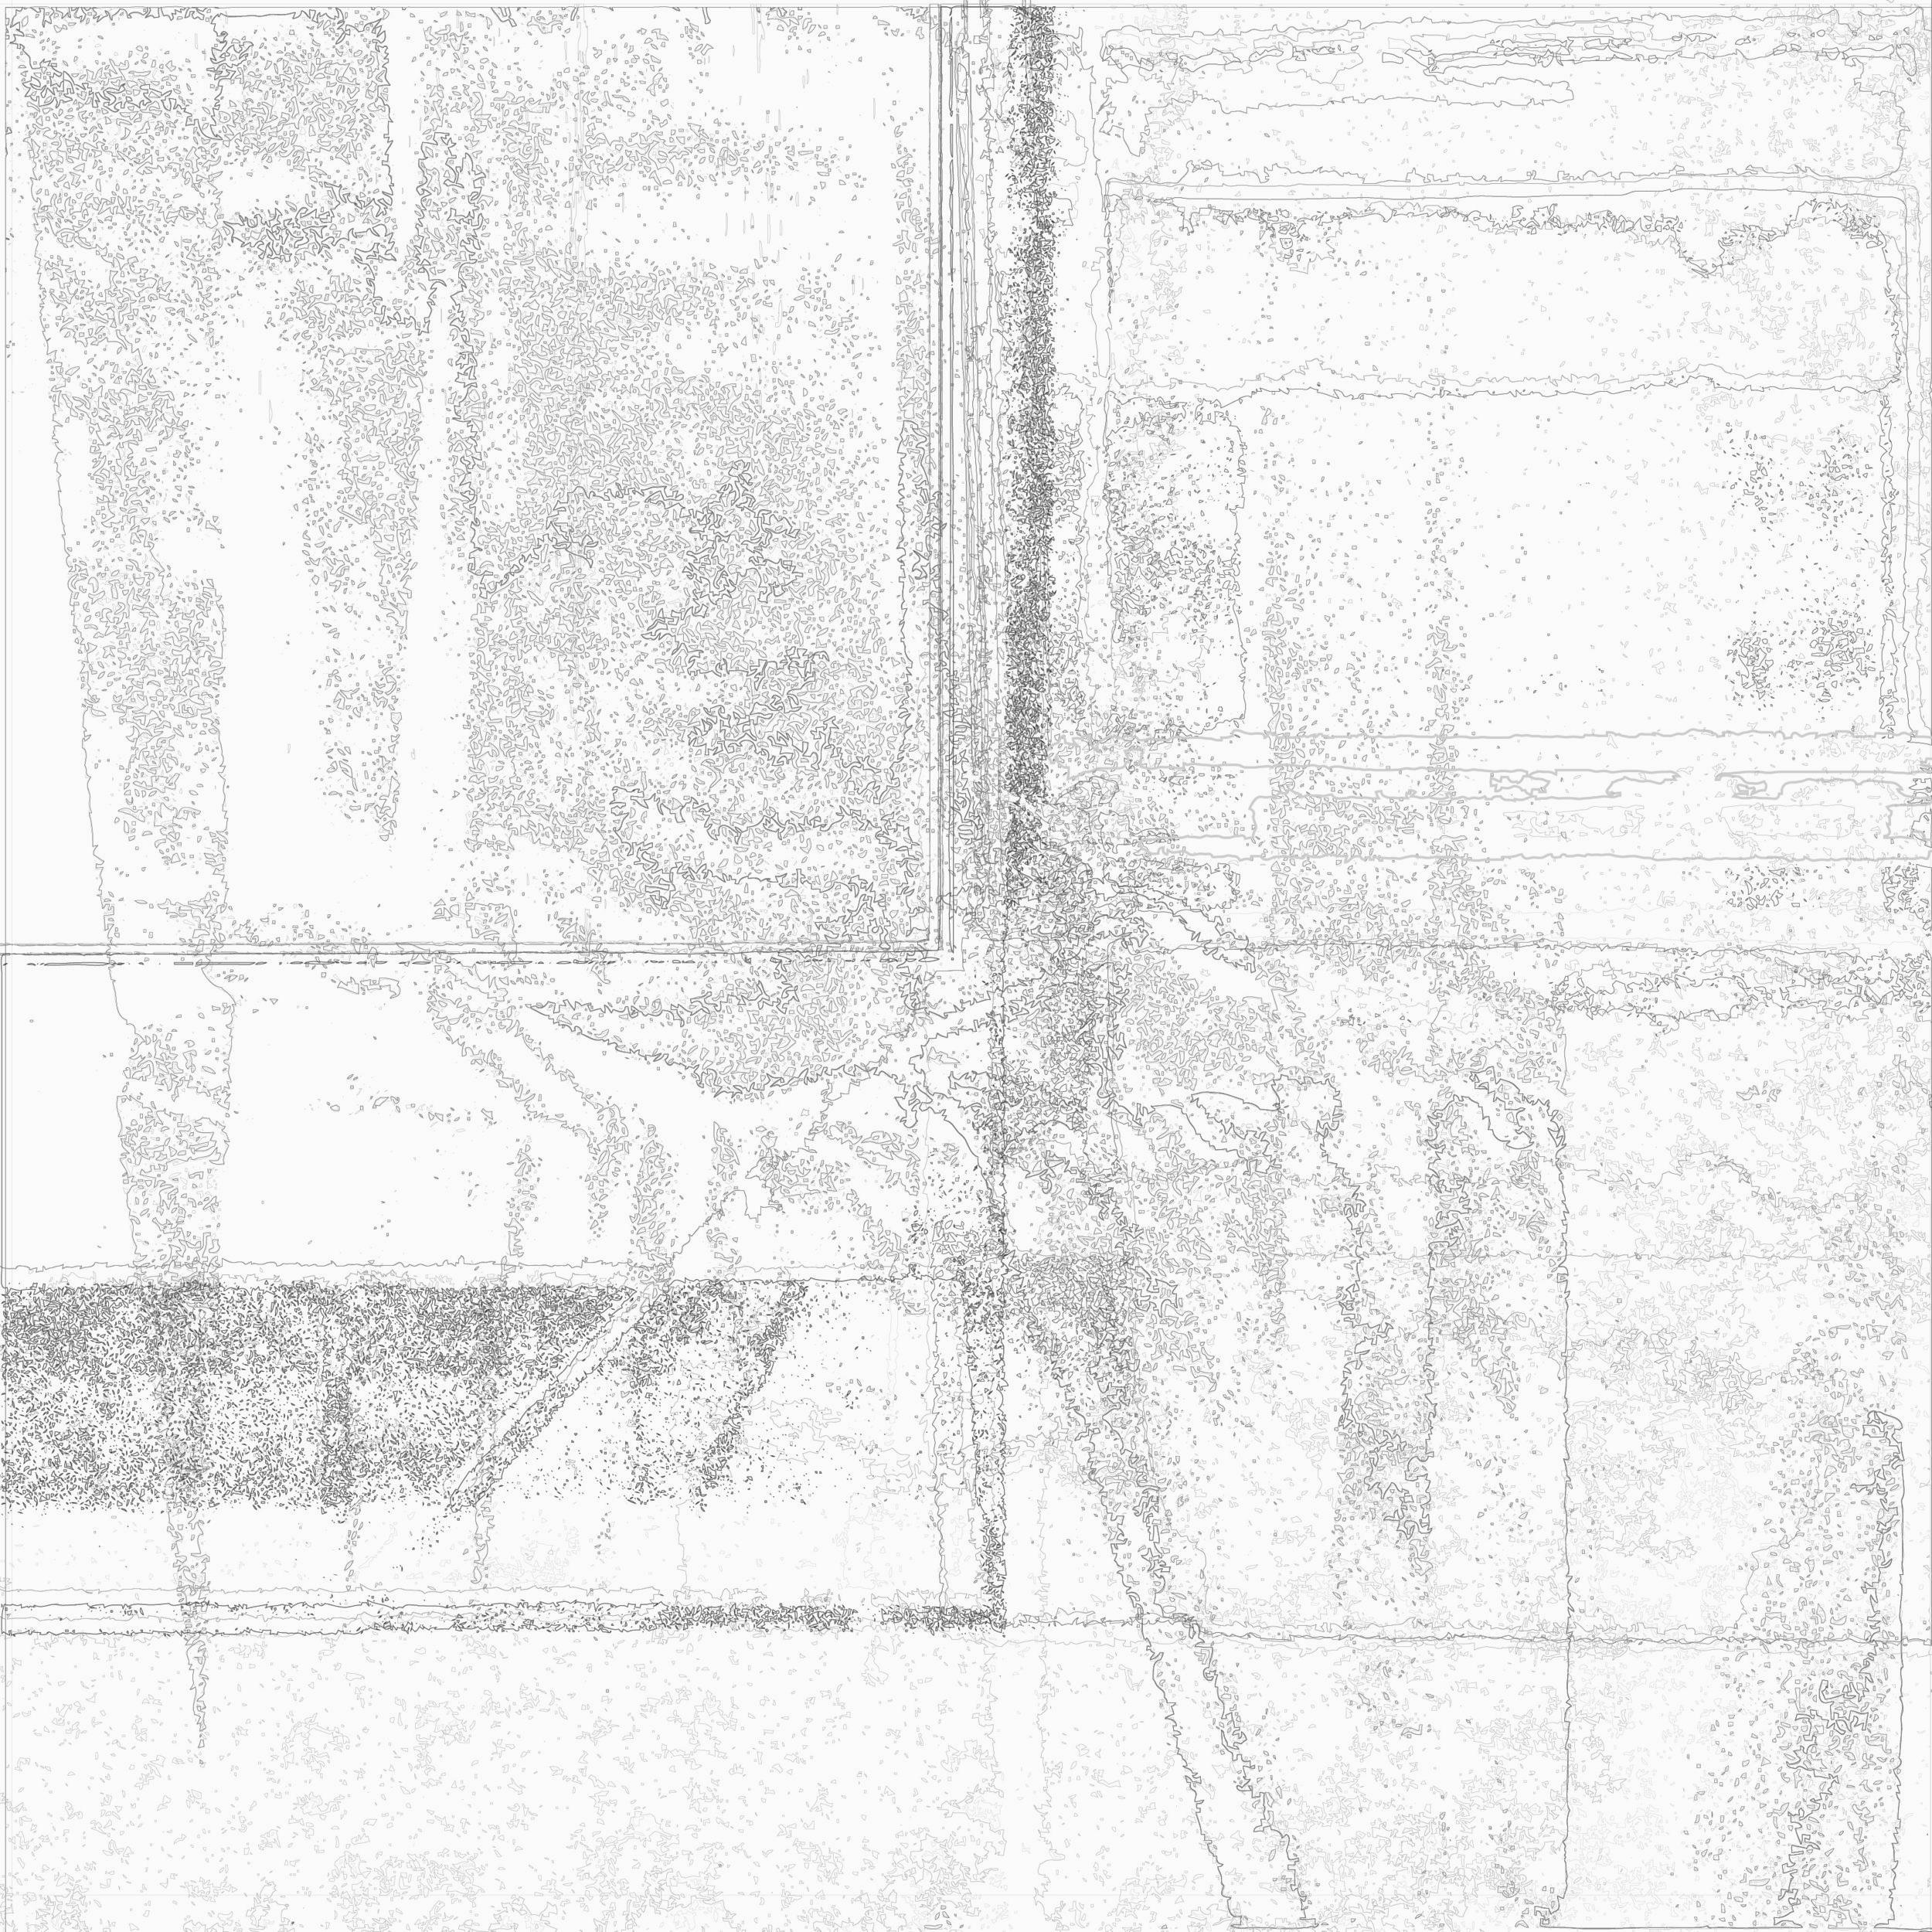 03_Scroope_MRT.jpg